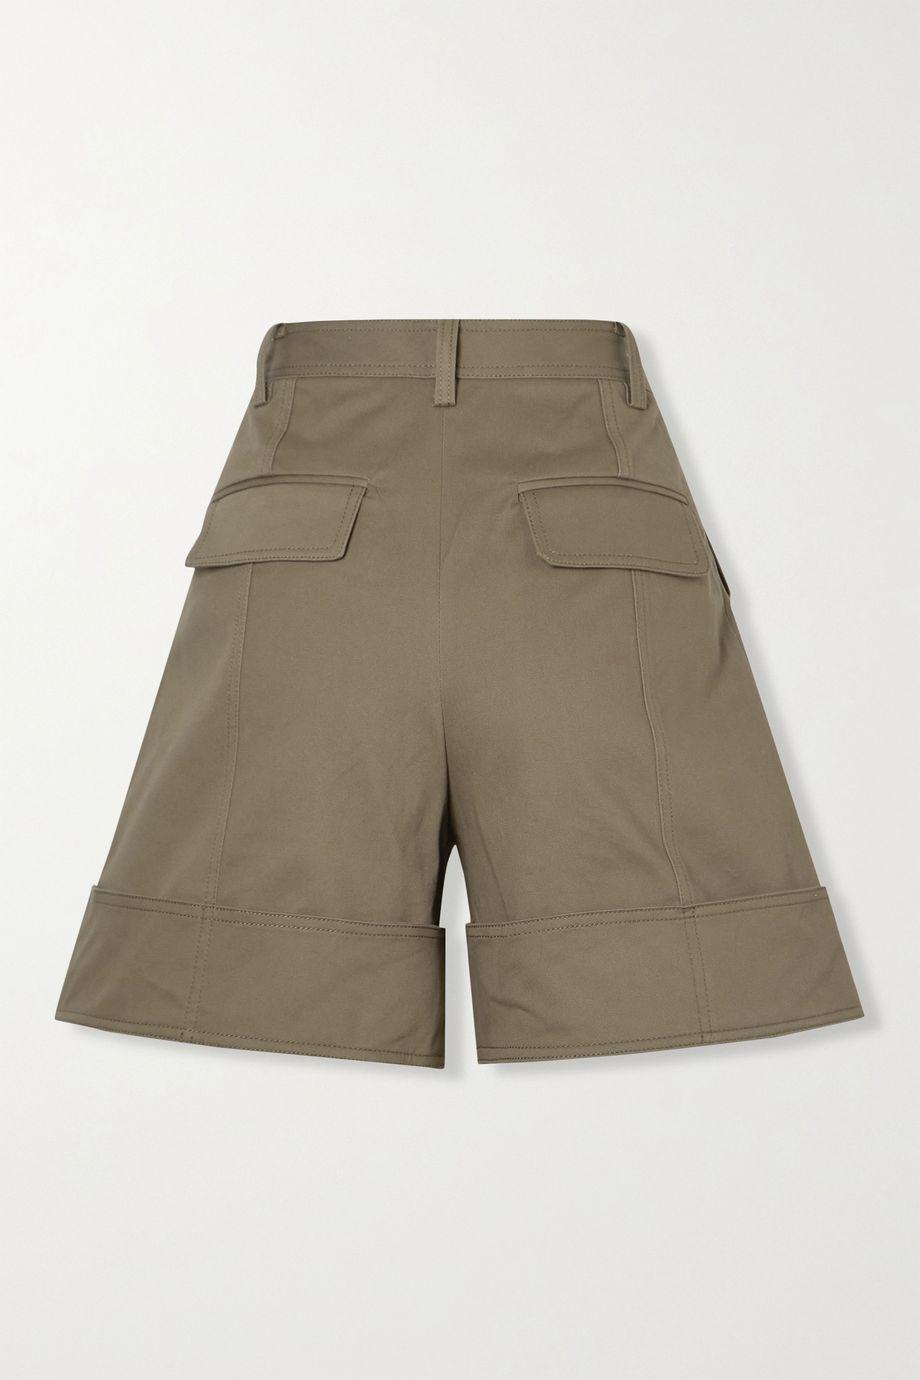 Tibi Myriam 棉质混纺斜纹布短裤